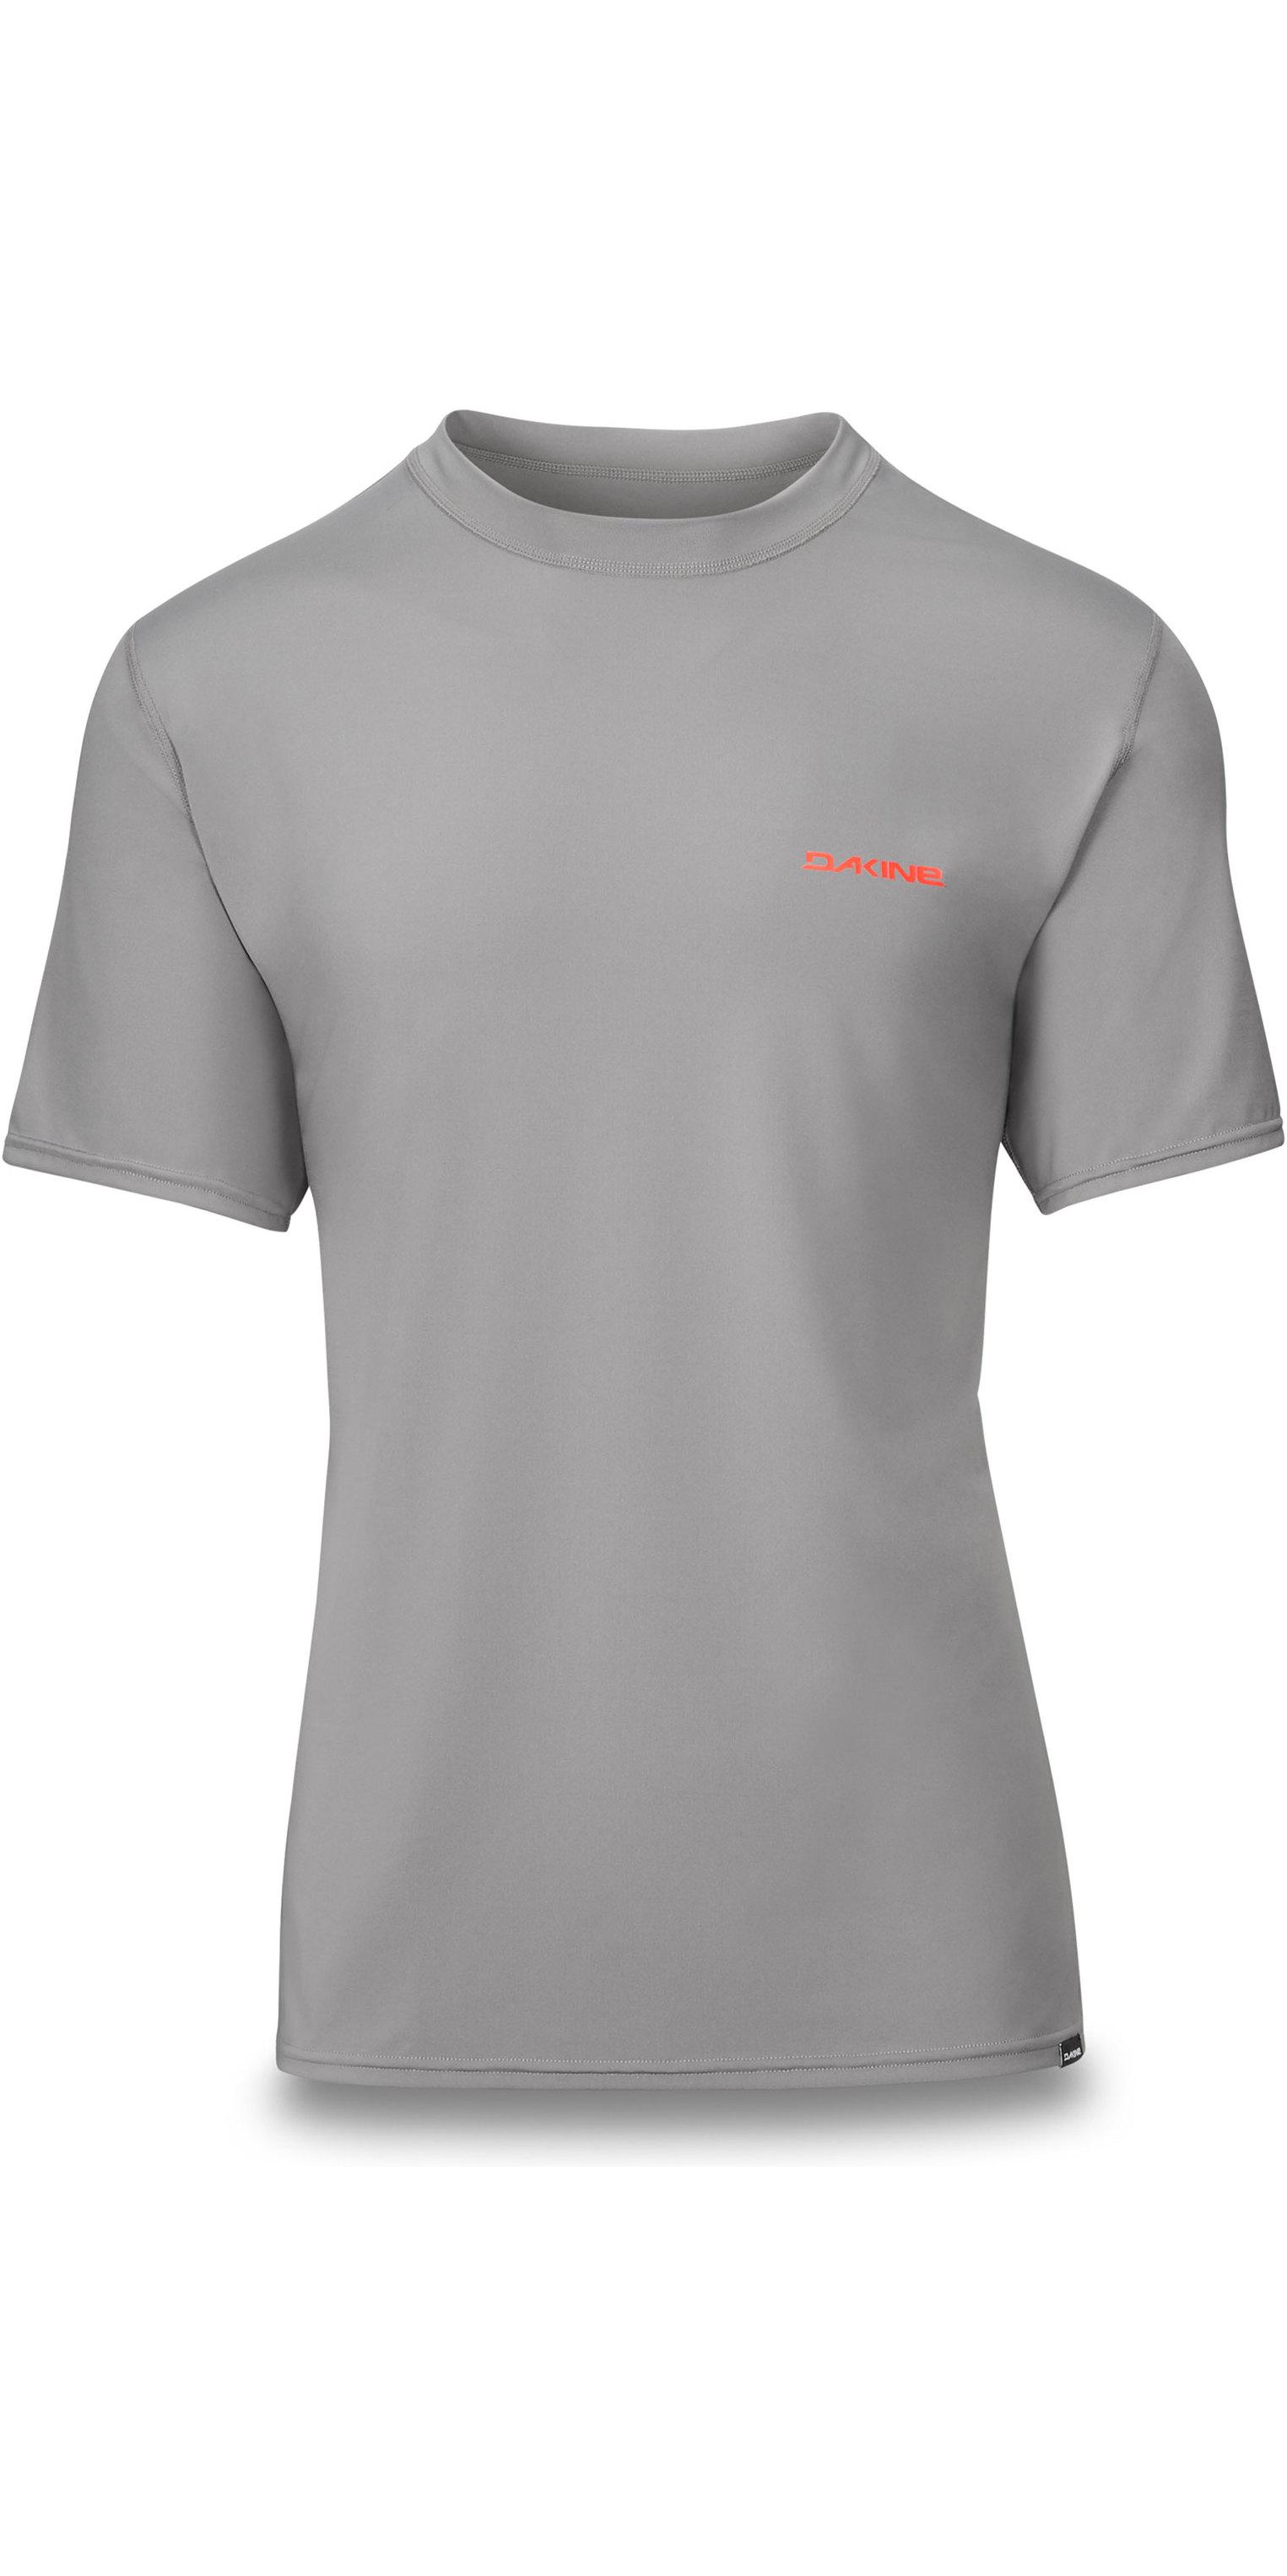 Dakine Mens Heavy Duty Loose Fit Long Sleeve Surf Shirt Carbon Short Sleeve